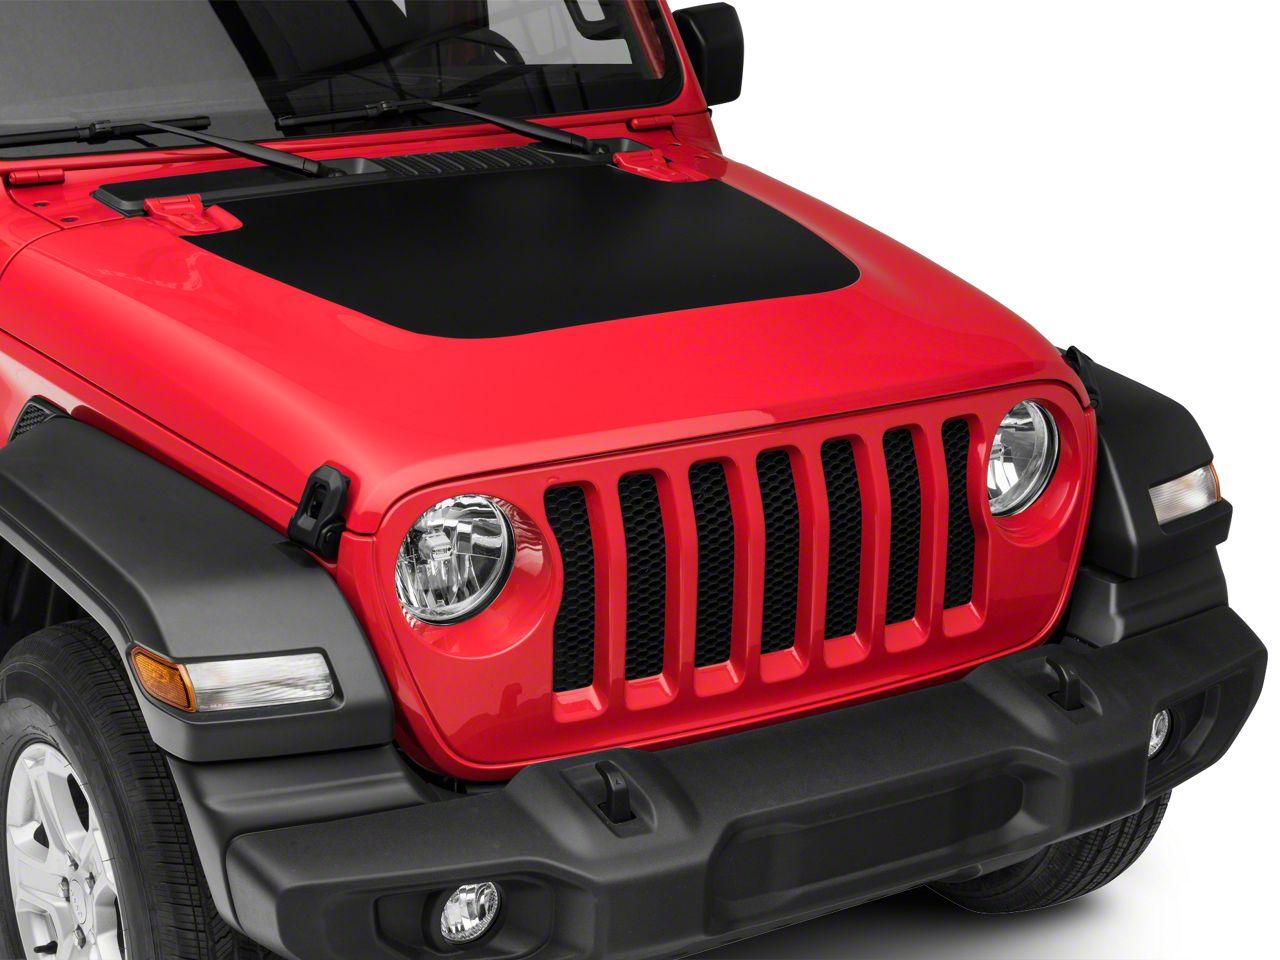 Sec10 Jeep Wrangler Hood Decal Matte Black J123770 Jl 18 21 Jeep Wrangler Jl Excluding Rubicon